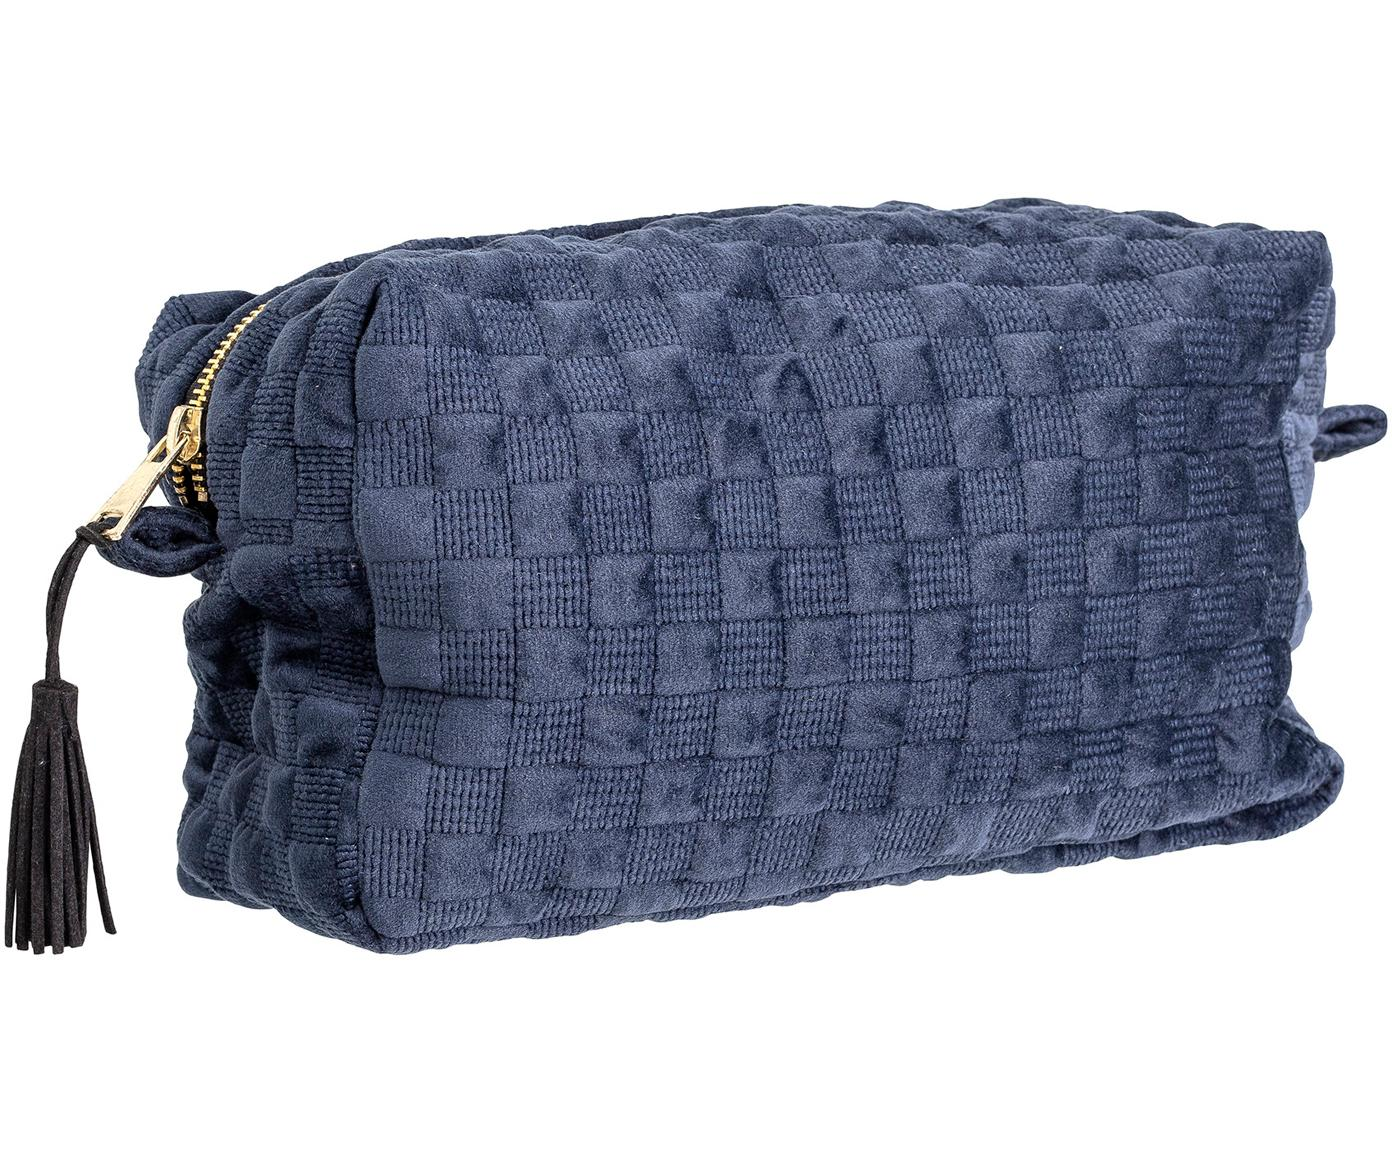 Kosmetiktasche Redo, Polyester, Blau, 25 x 15 cm